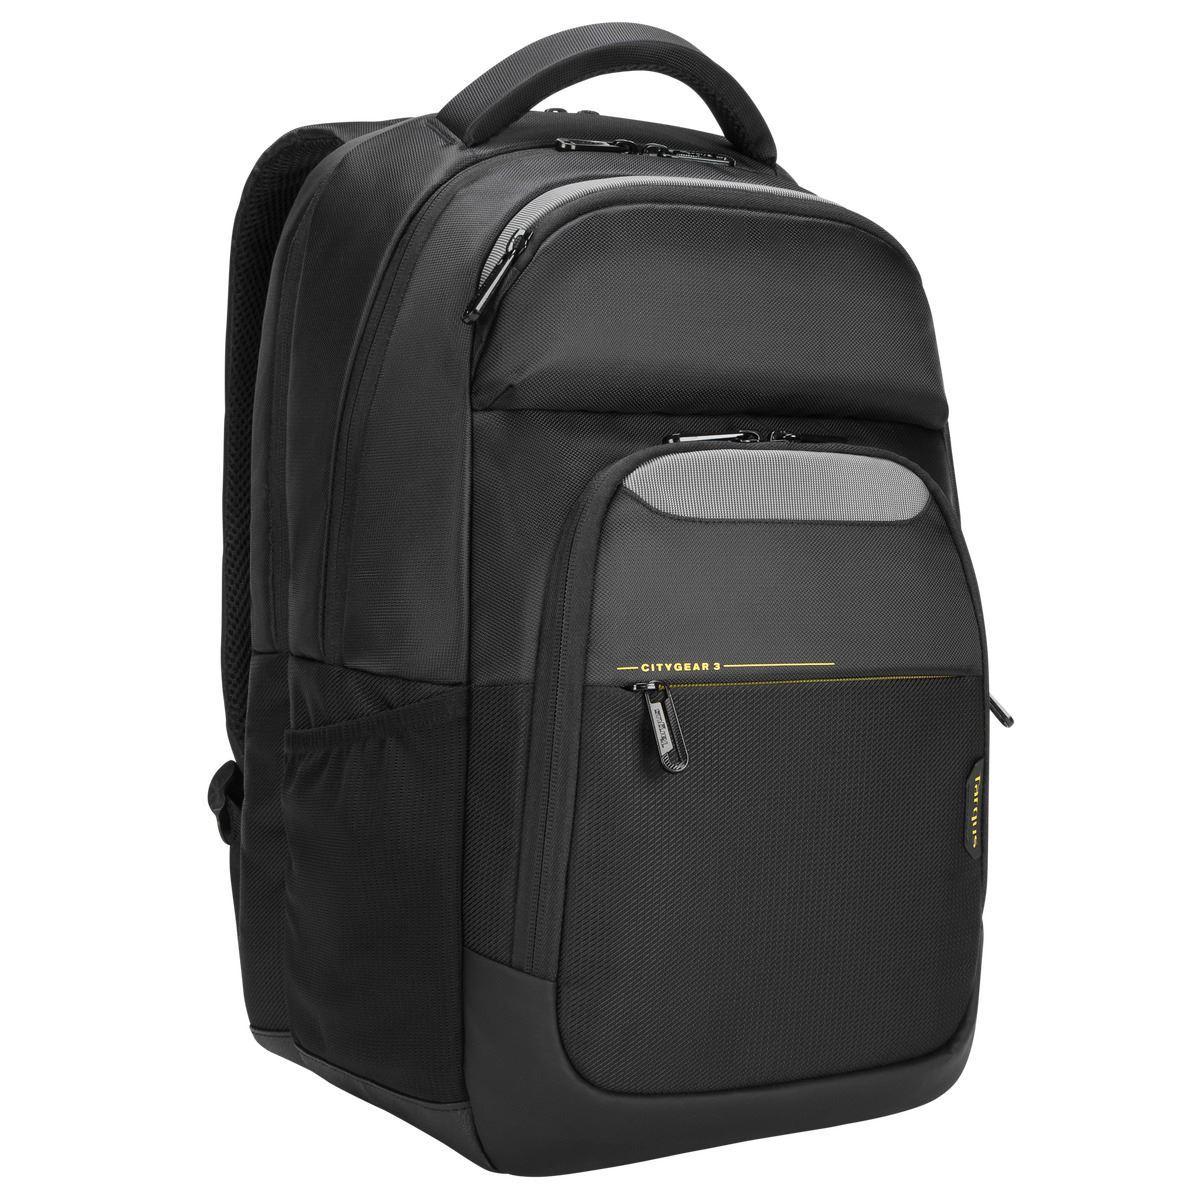 Targus City Gear 3 backpack Polyurethane Black